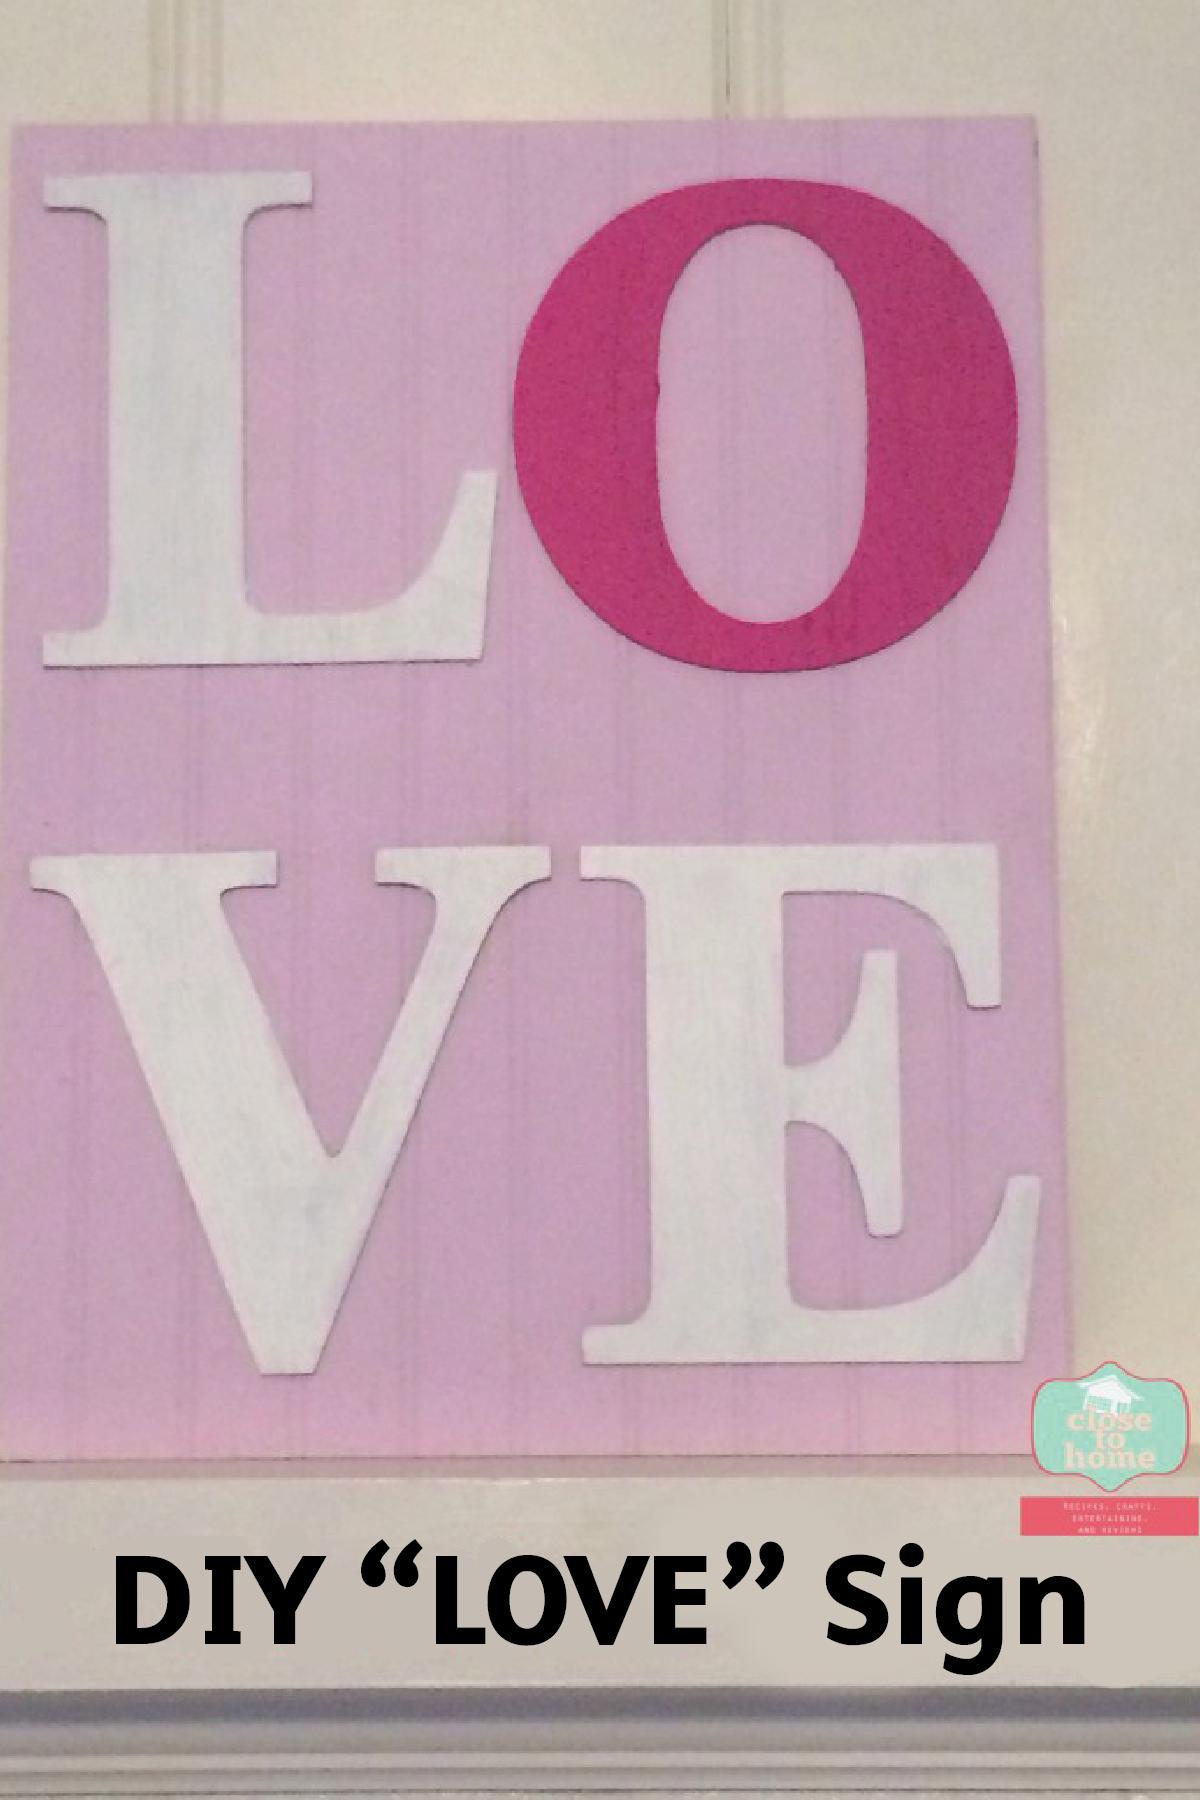 DIY Valentines Day Mantel Decor | Diy signs and DIY Valentine